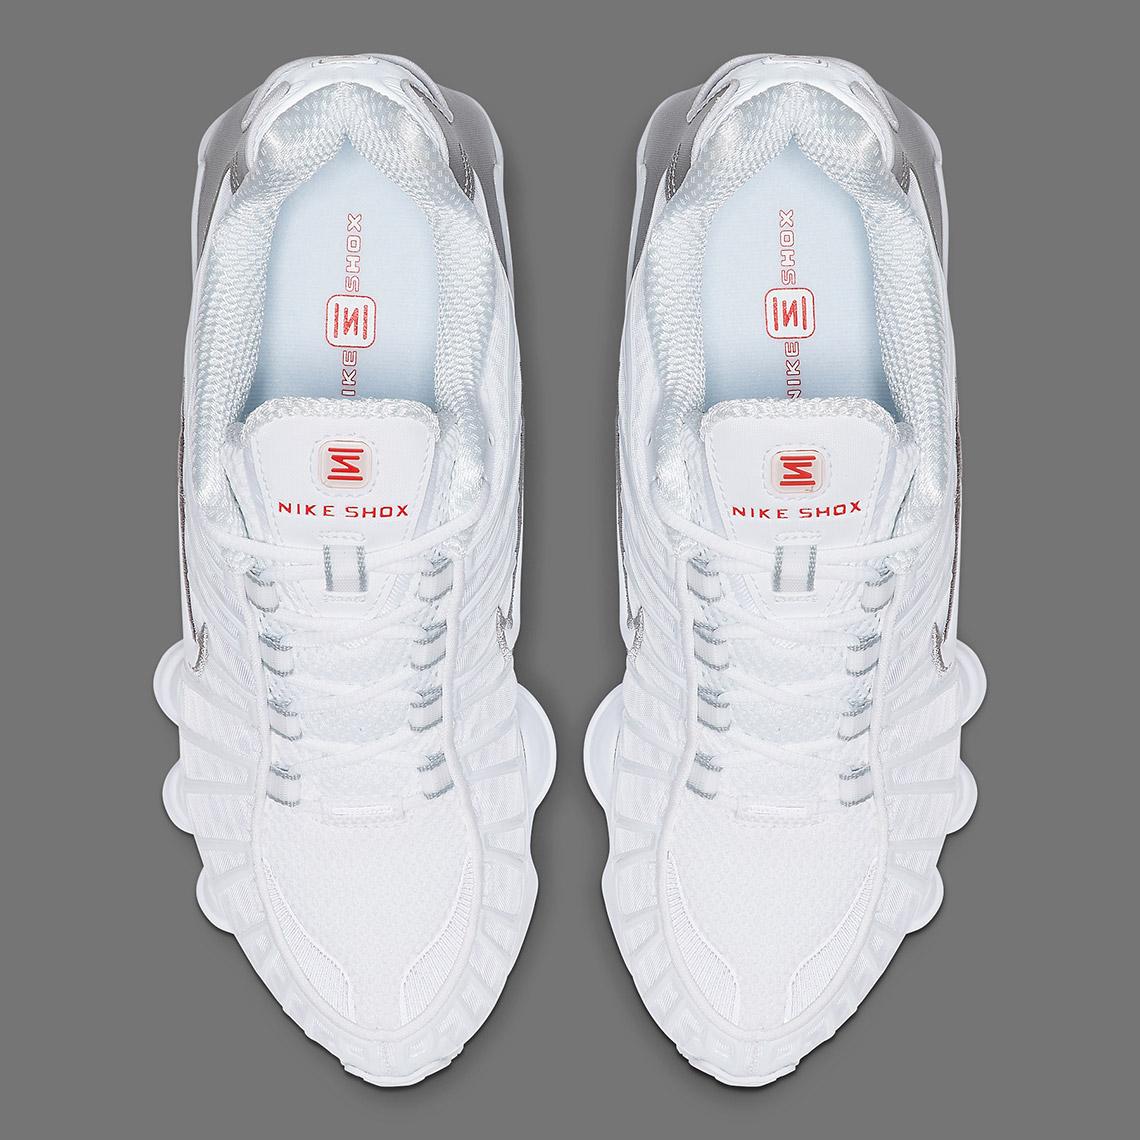 Nike Shox TL White Silver AR3566 100 Release Date + Info ...